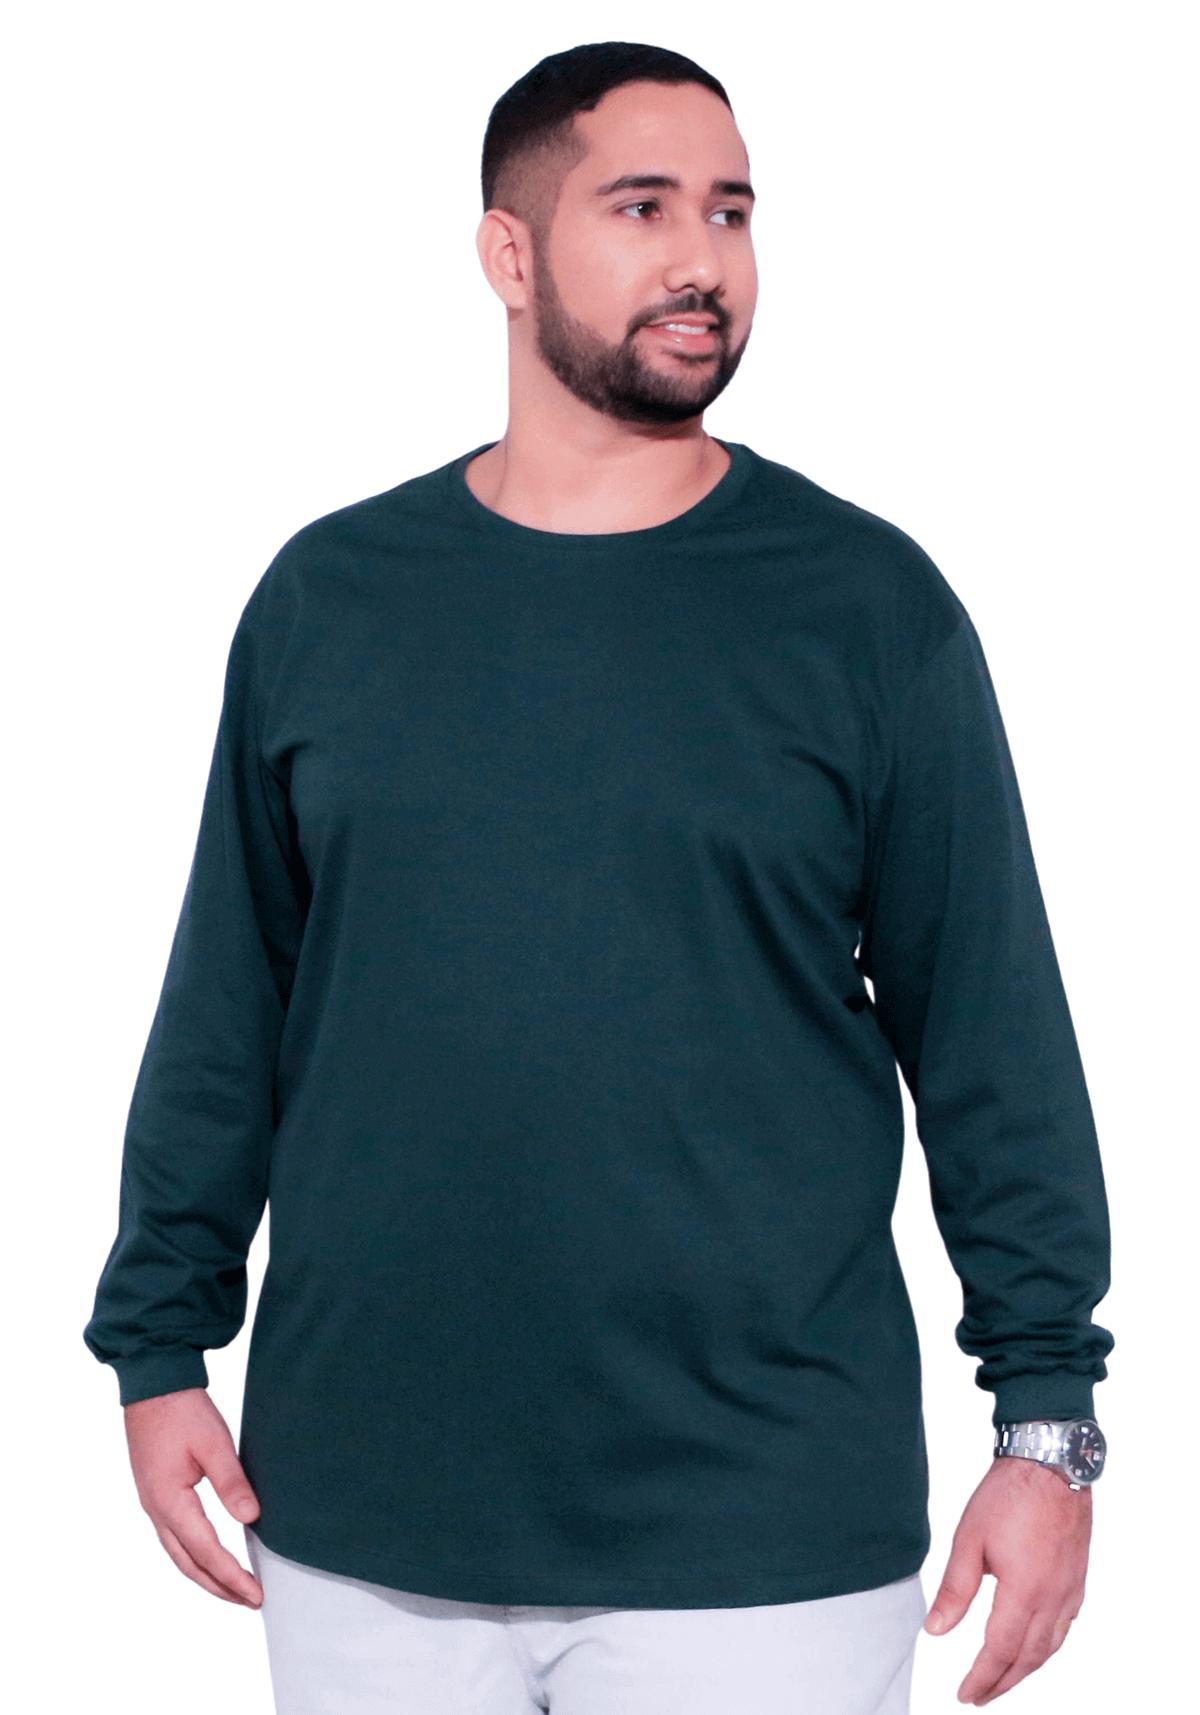 Camiseta Básica Manga Longa Plus Size 100% Algodão